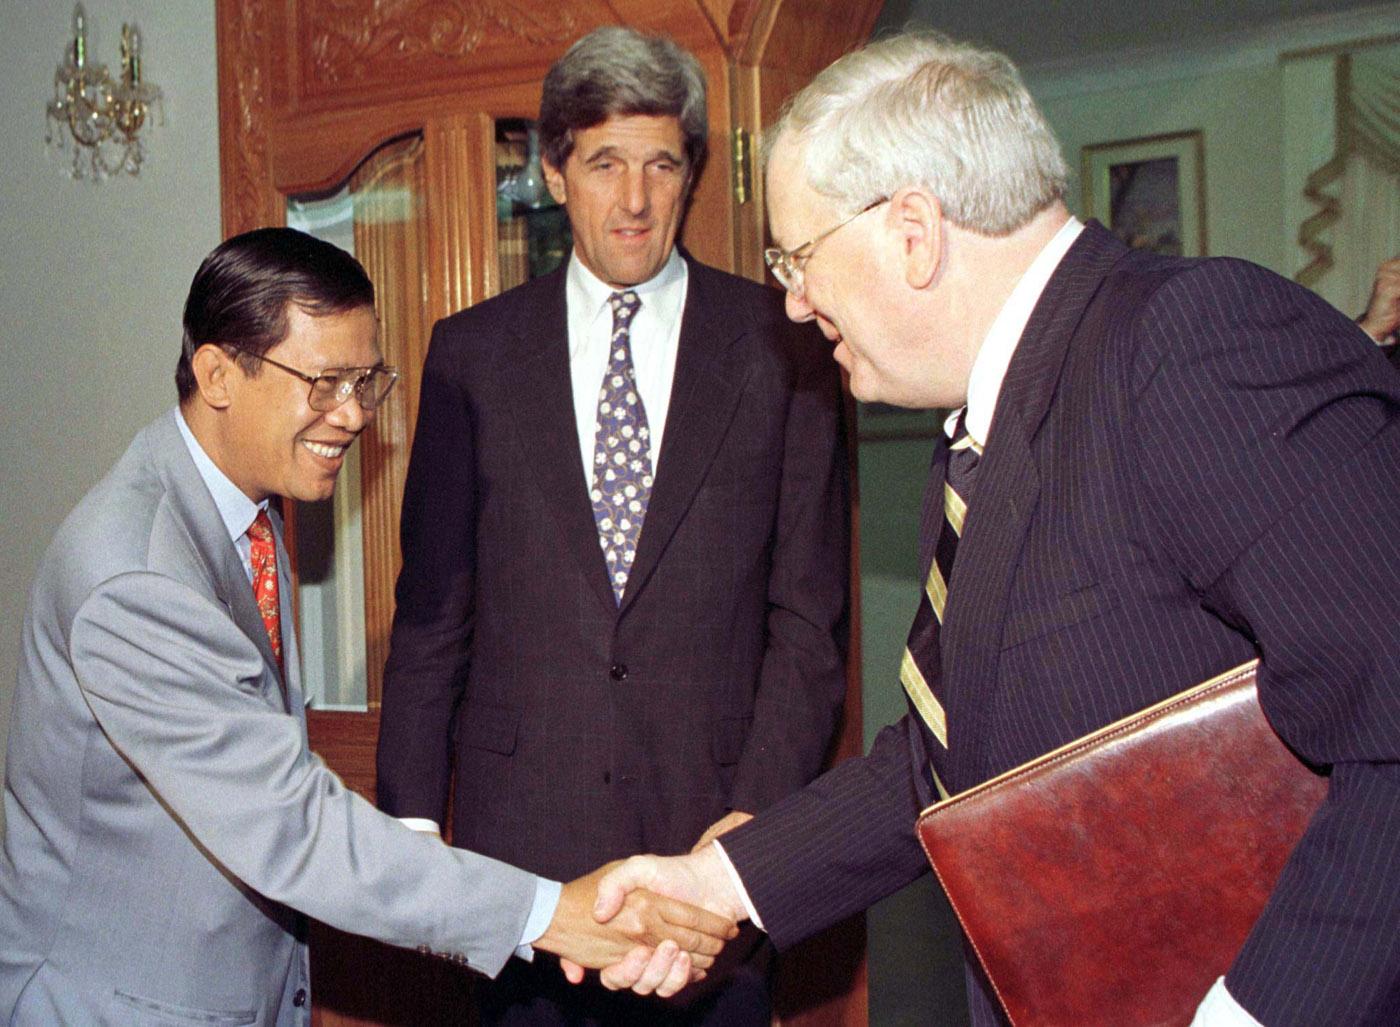 Prime Minister Hun Sen greets US Ambassador Kenneth Quinn